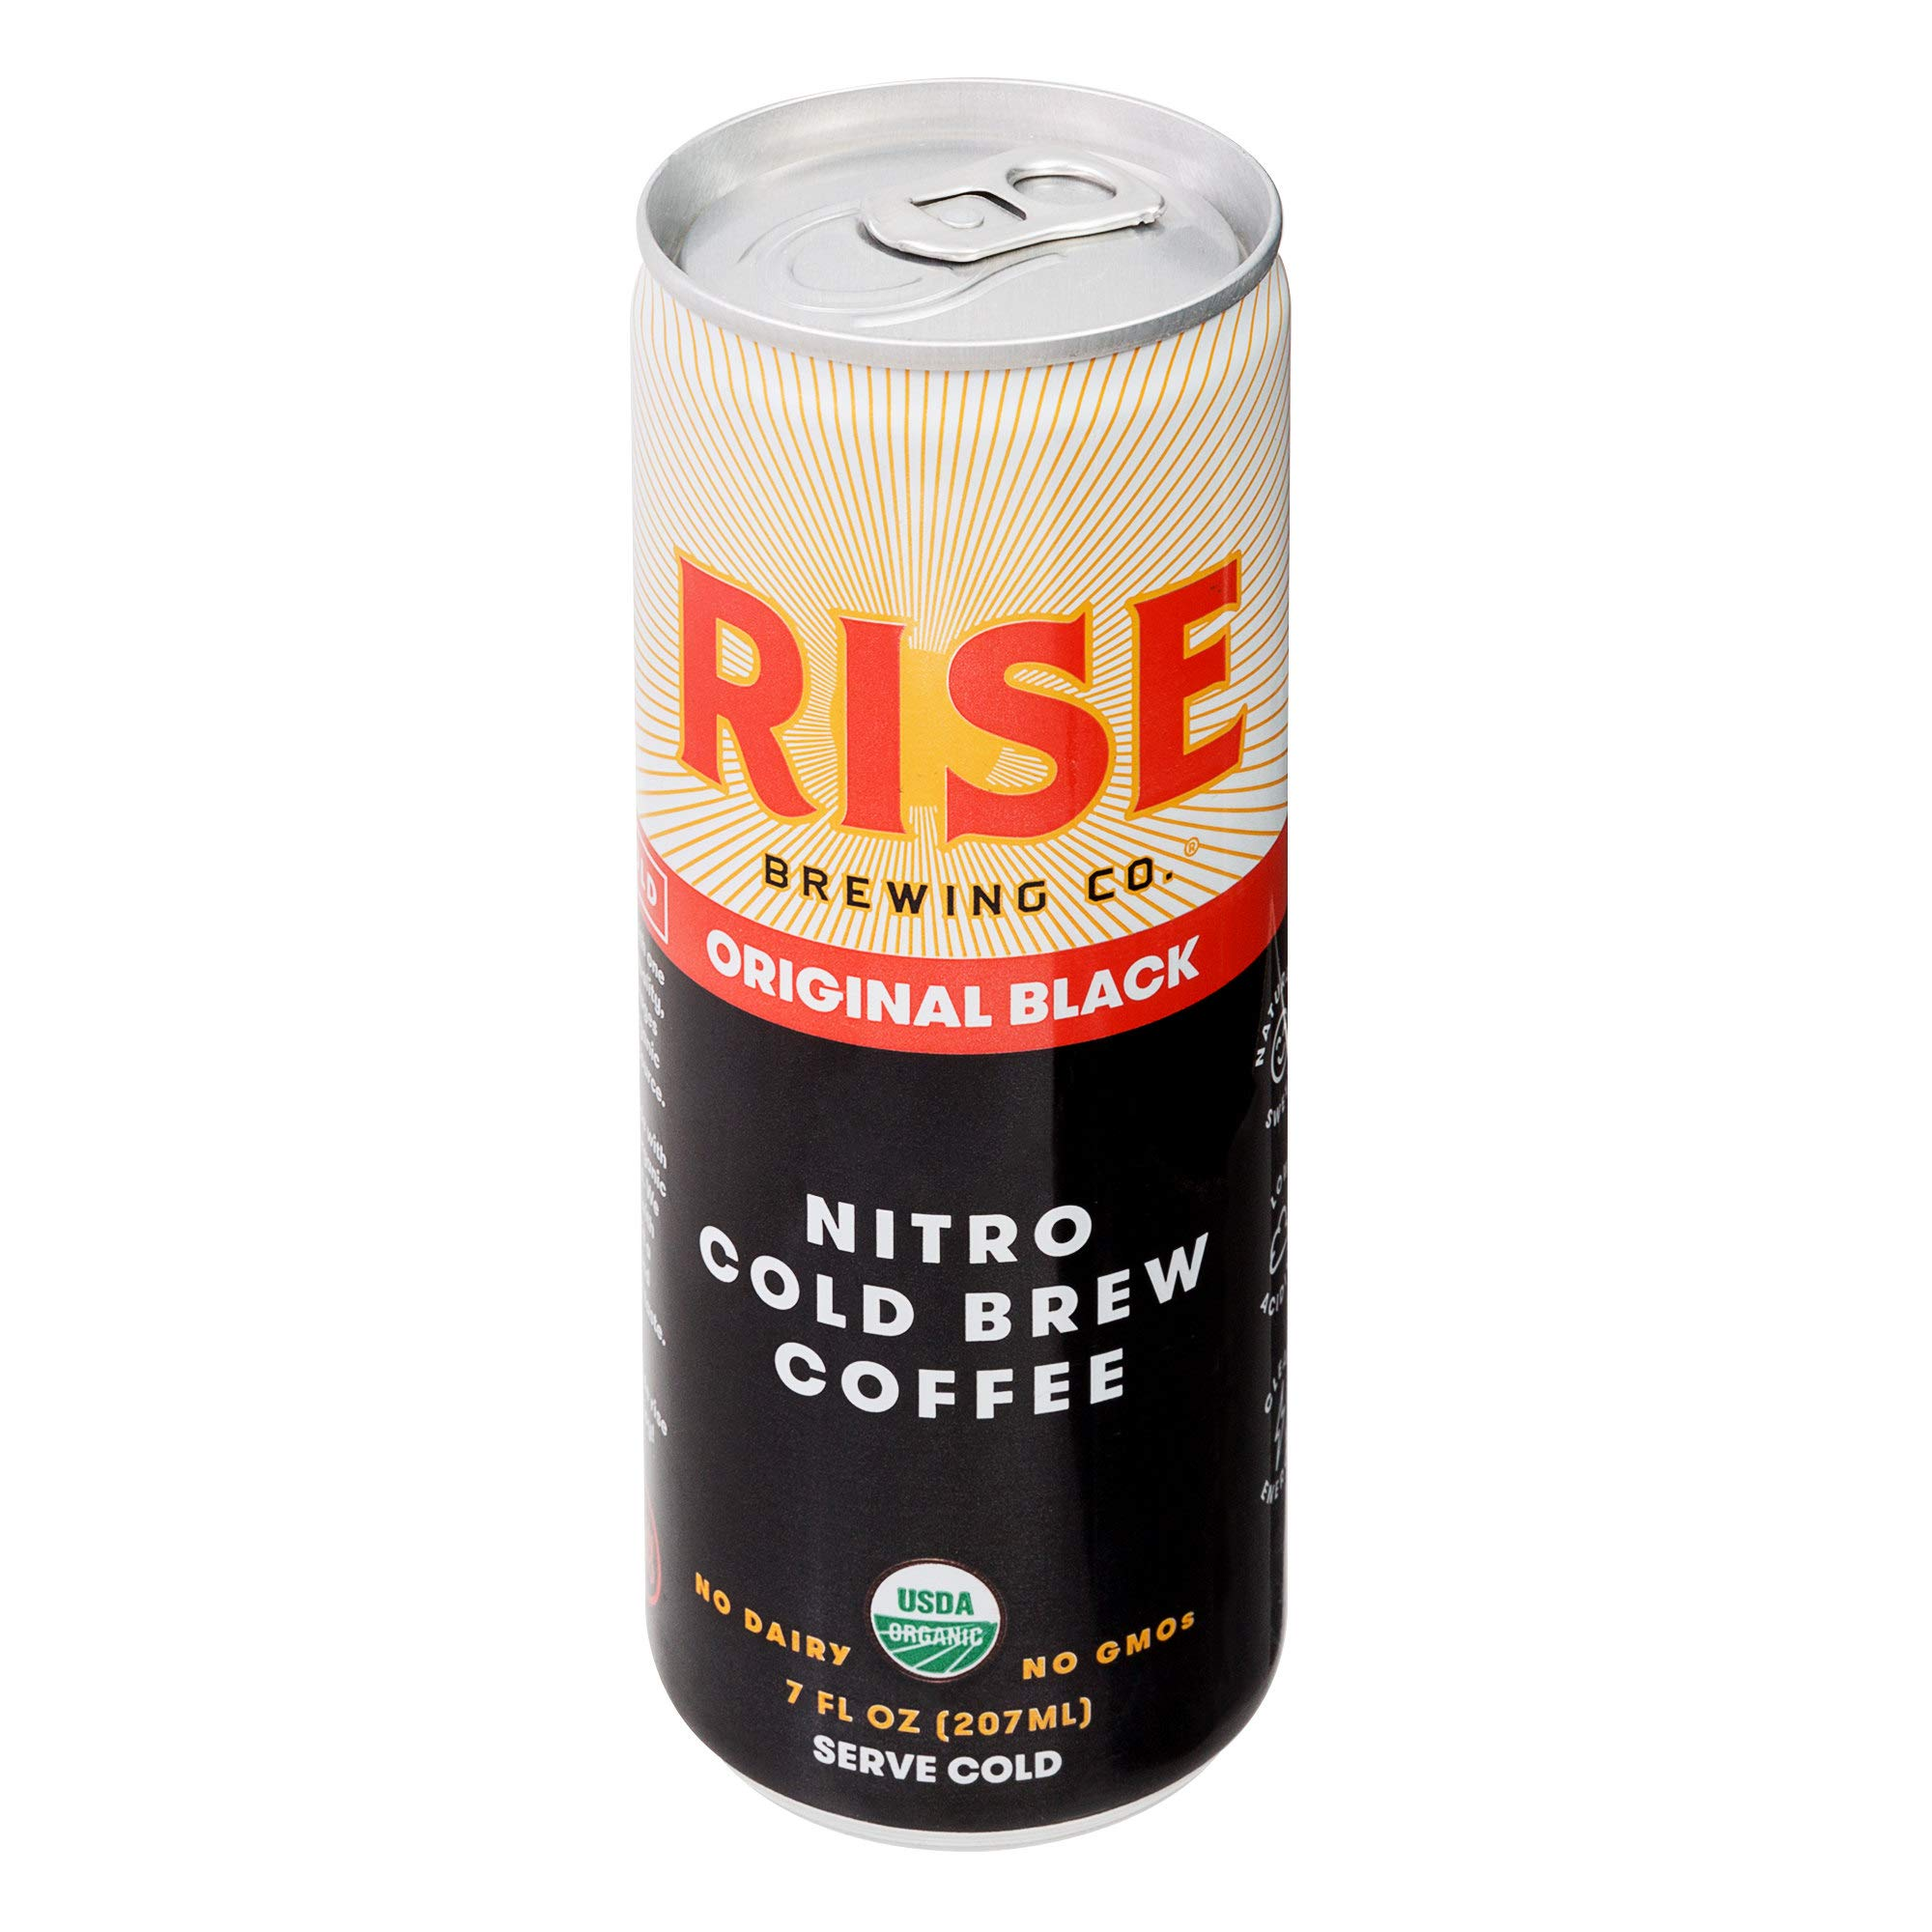 TableTop King 7 oz. Original Black Nitro Cold Brew Coffee - 12/Case by TableTop King (Image #1)